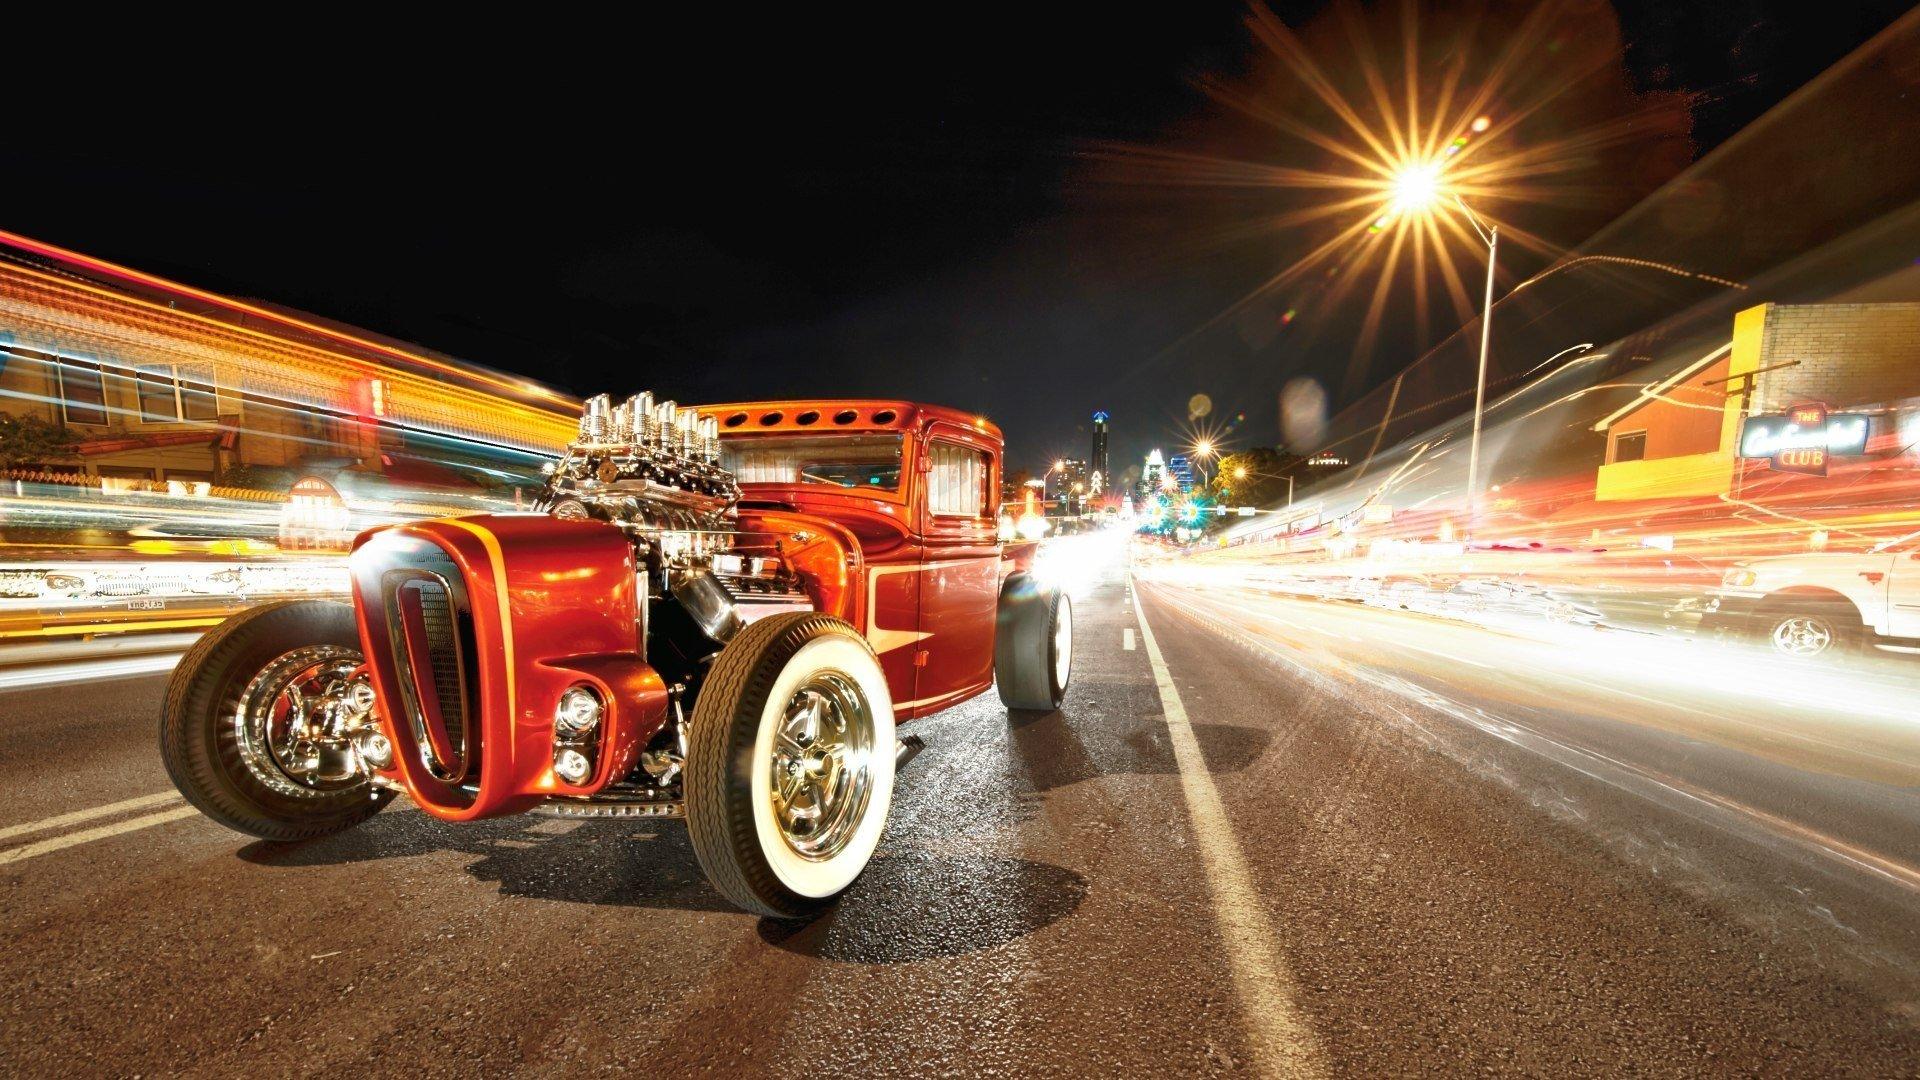 Fahrzeuge   Hot Rod Wallpaper 1920x1080